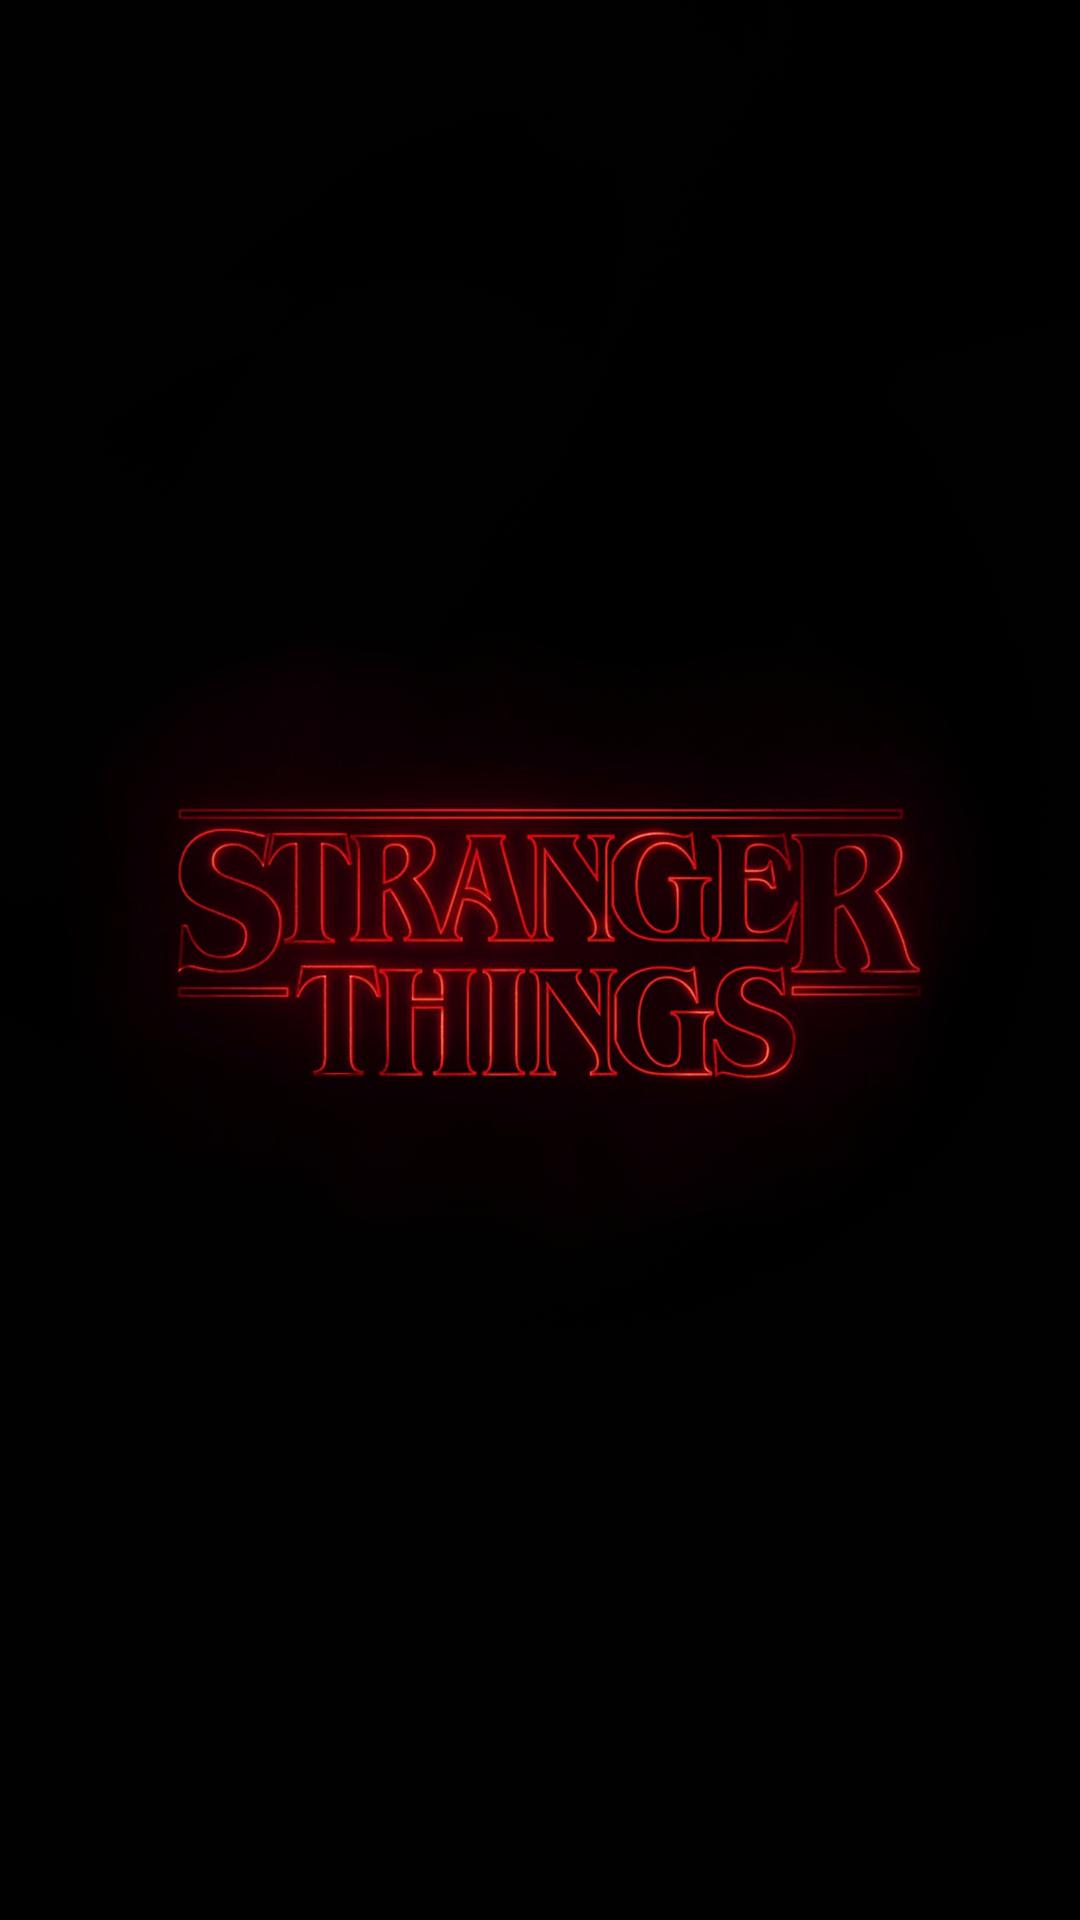 Stranger Things Iphone Wallpapers Top Free Stranger Things